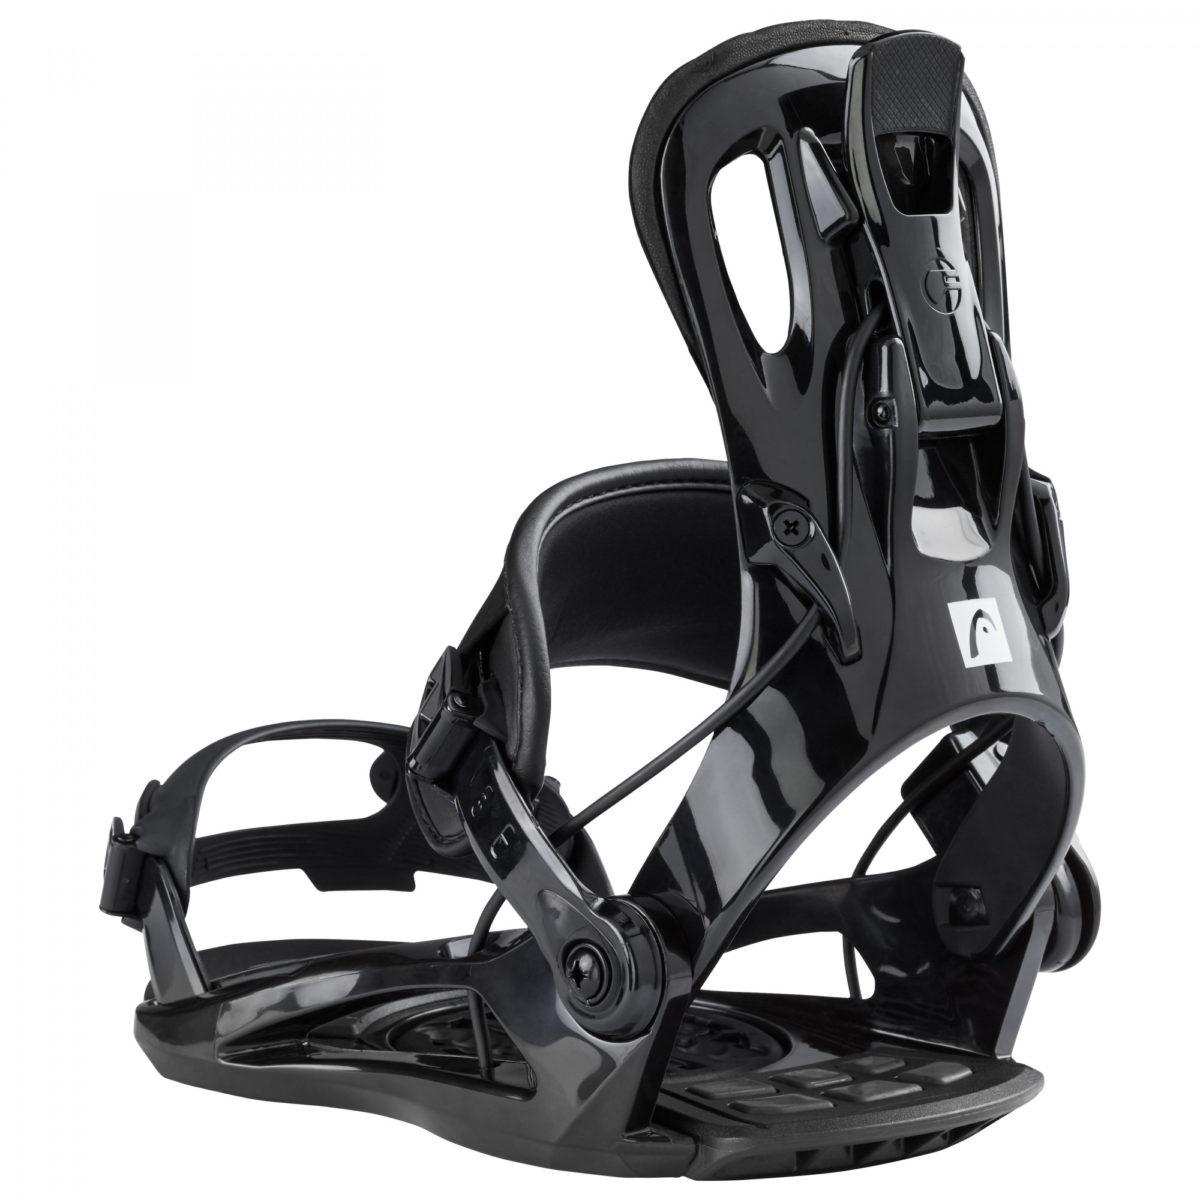 HEAD Крепления для сноуборда RX One  344309 - 2